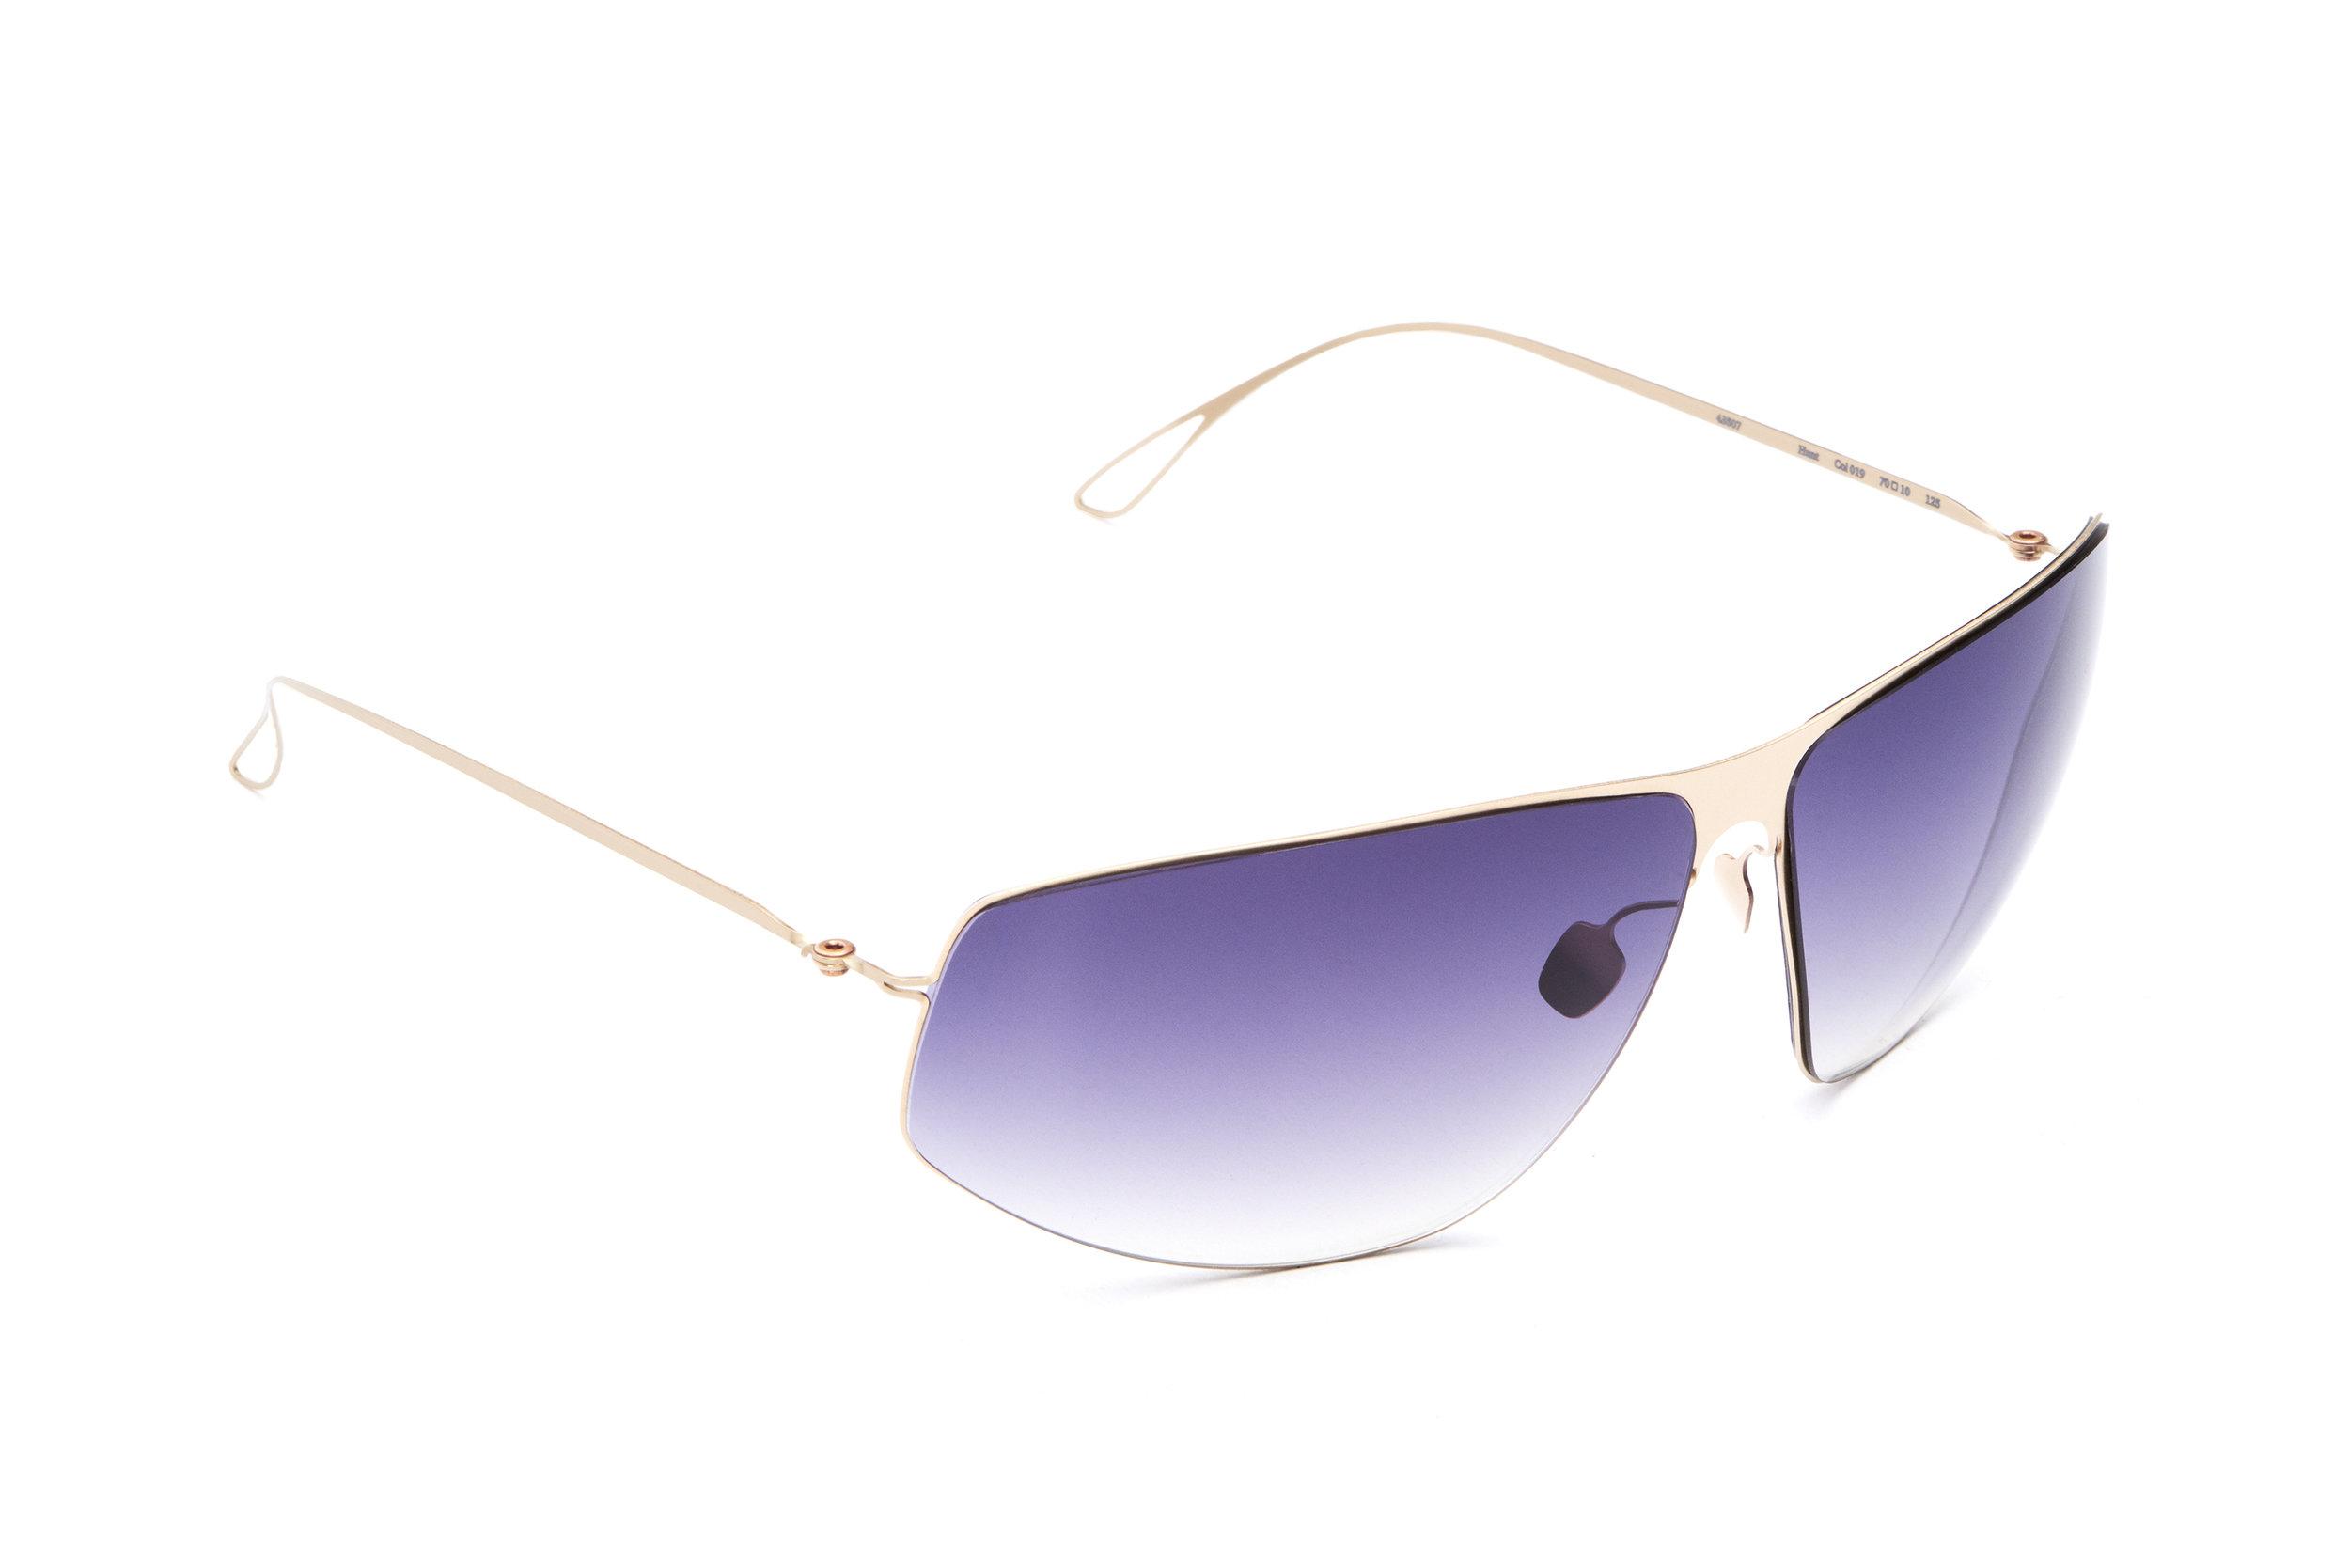 haffmans_neumeister_hunt_cremant_purplerain_gradient_ultralight_sunglasses_angle_102478.jpg